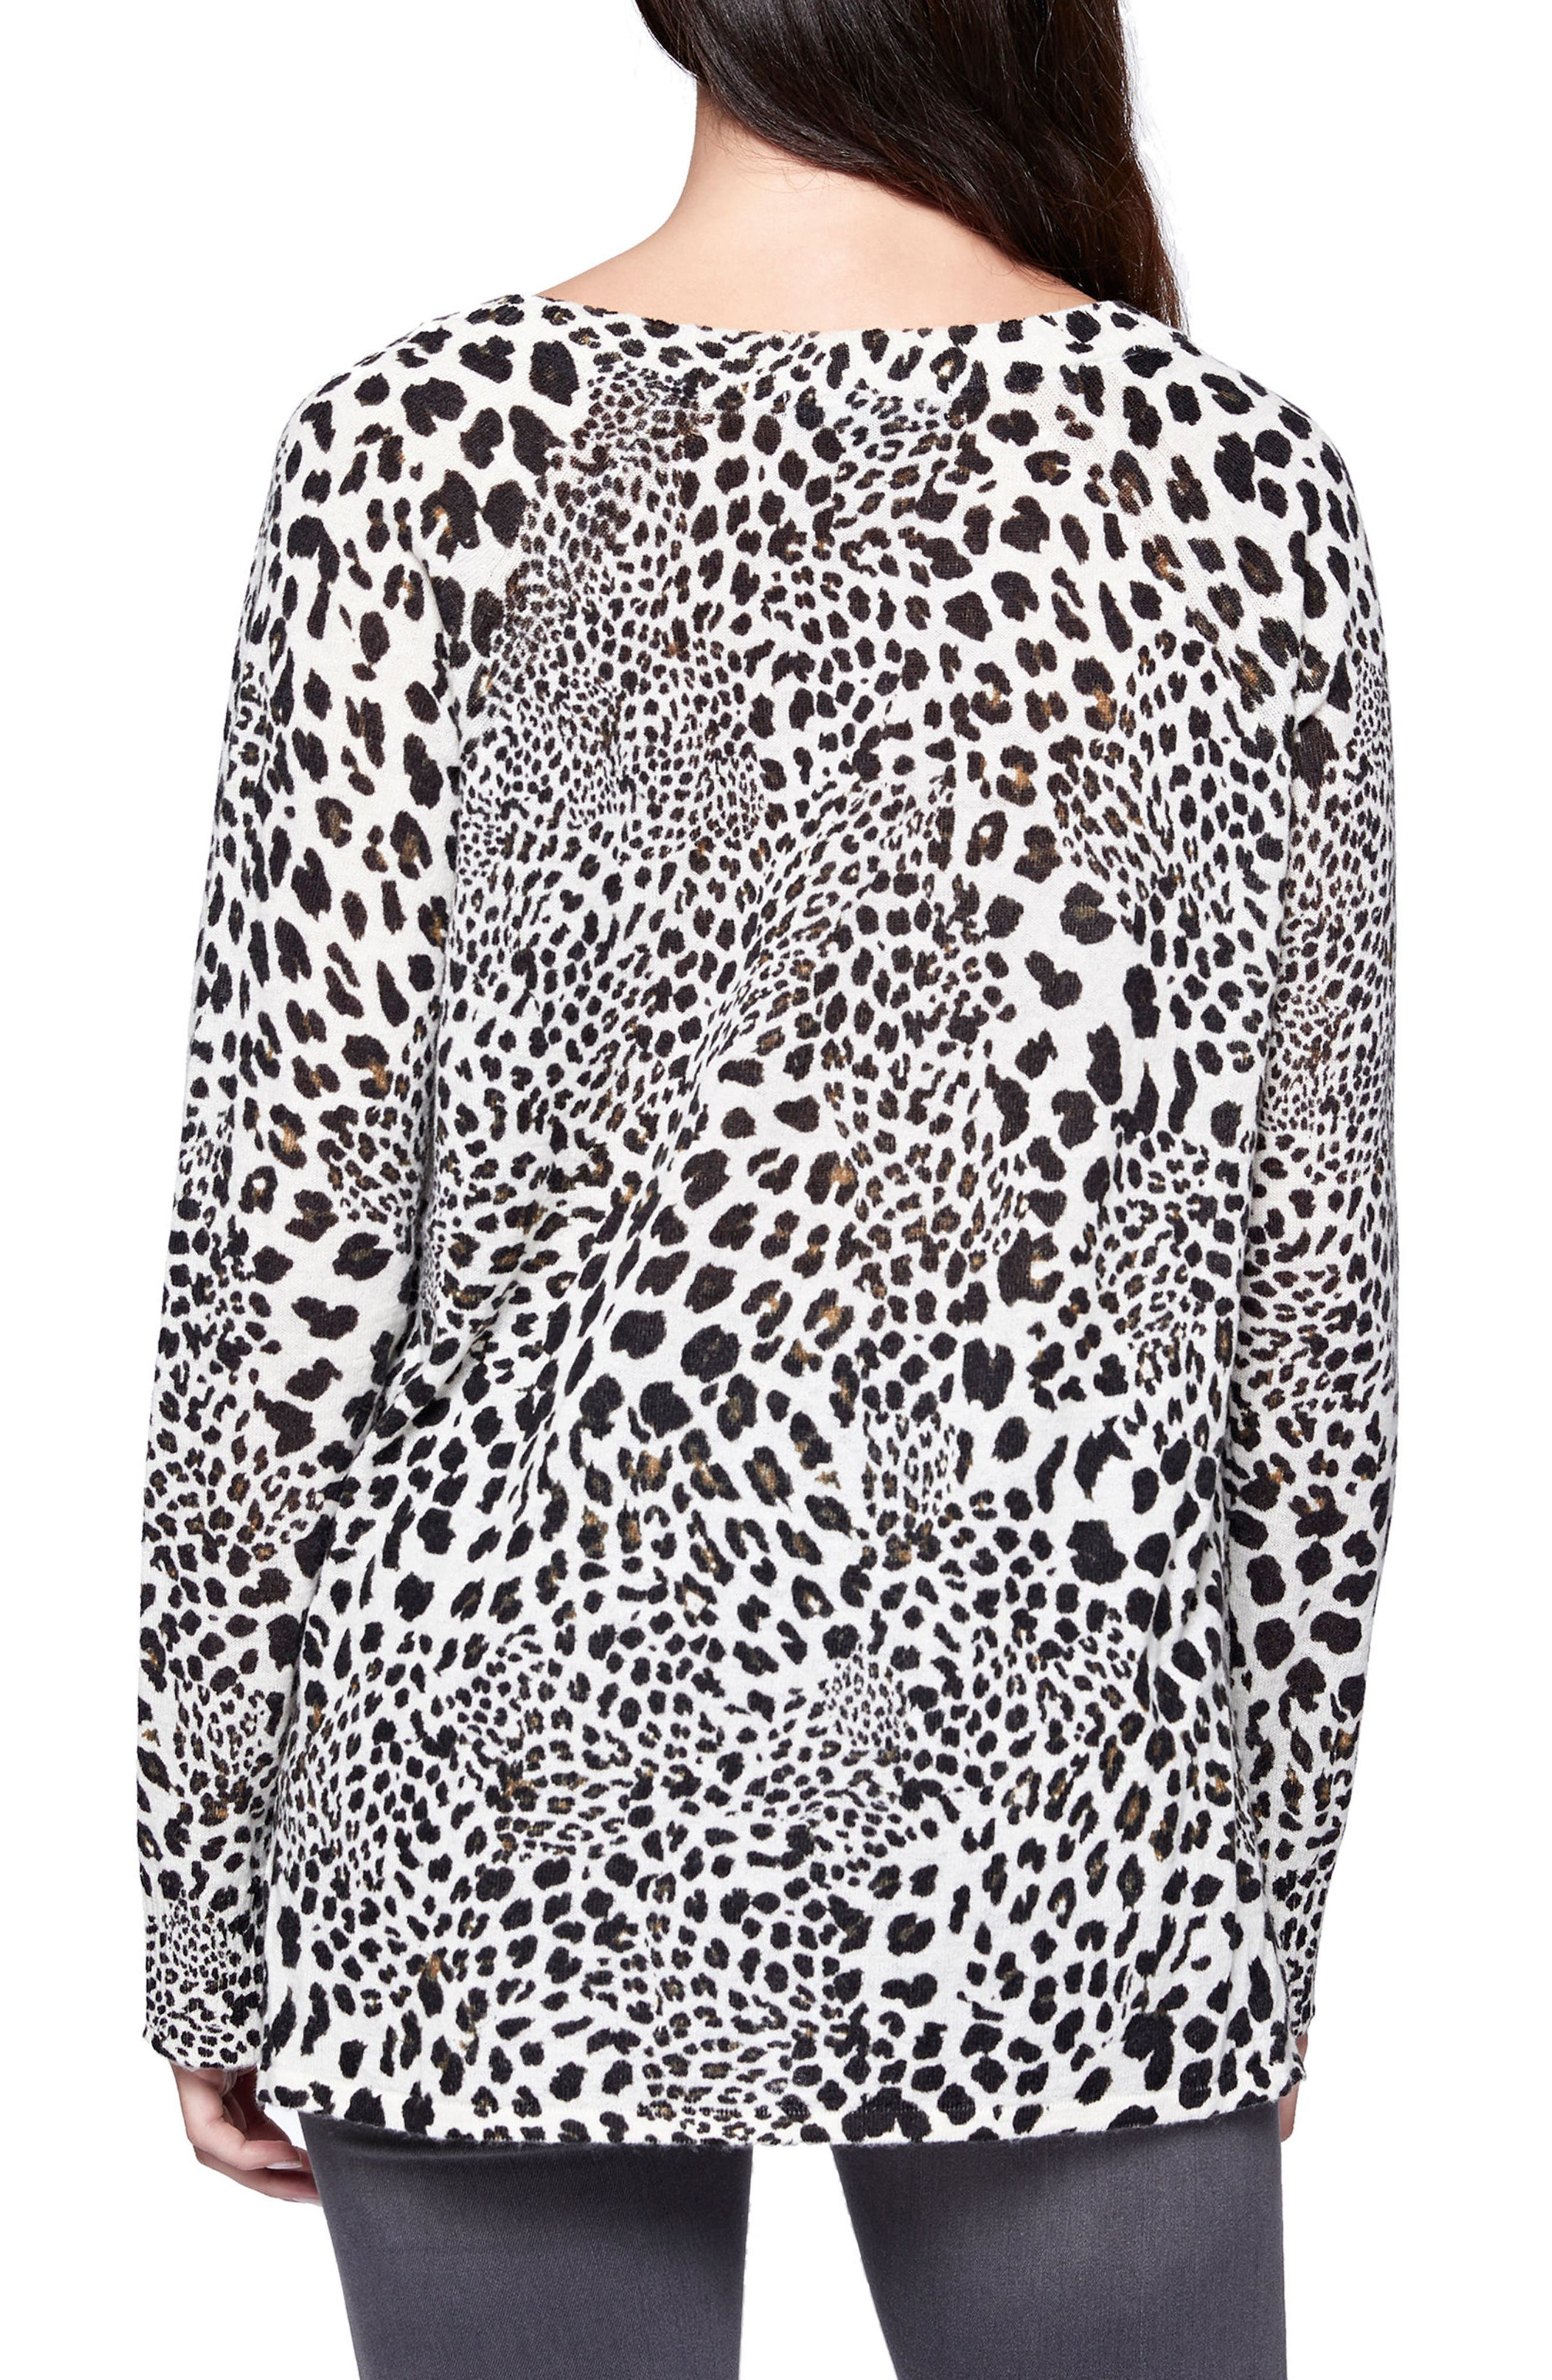 Cabaret Crew Animal Print Sweater,                             Alternate thumbnail 2, color,                             299